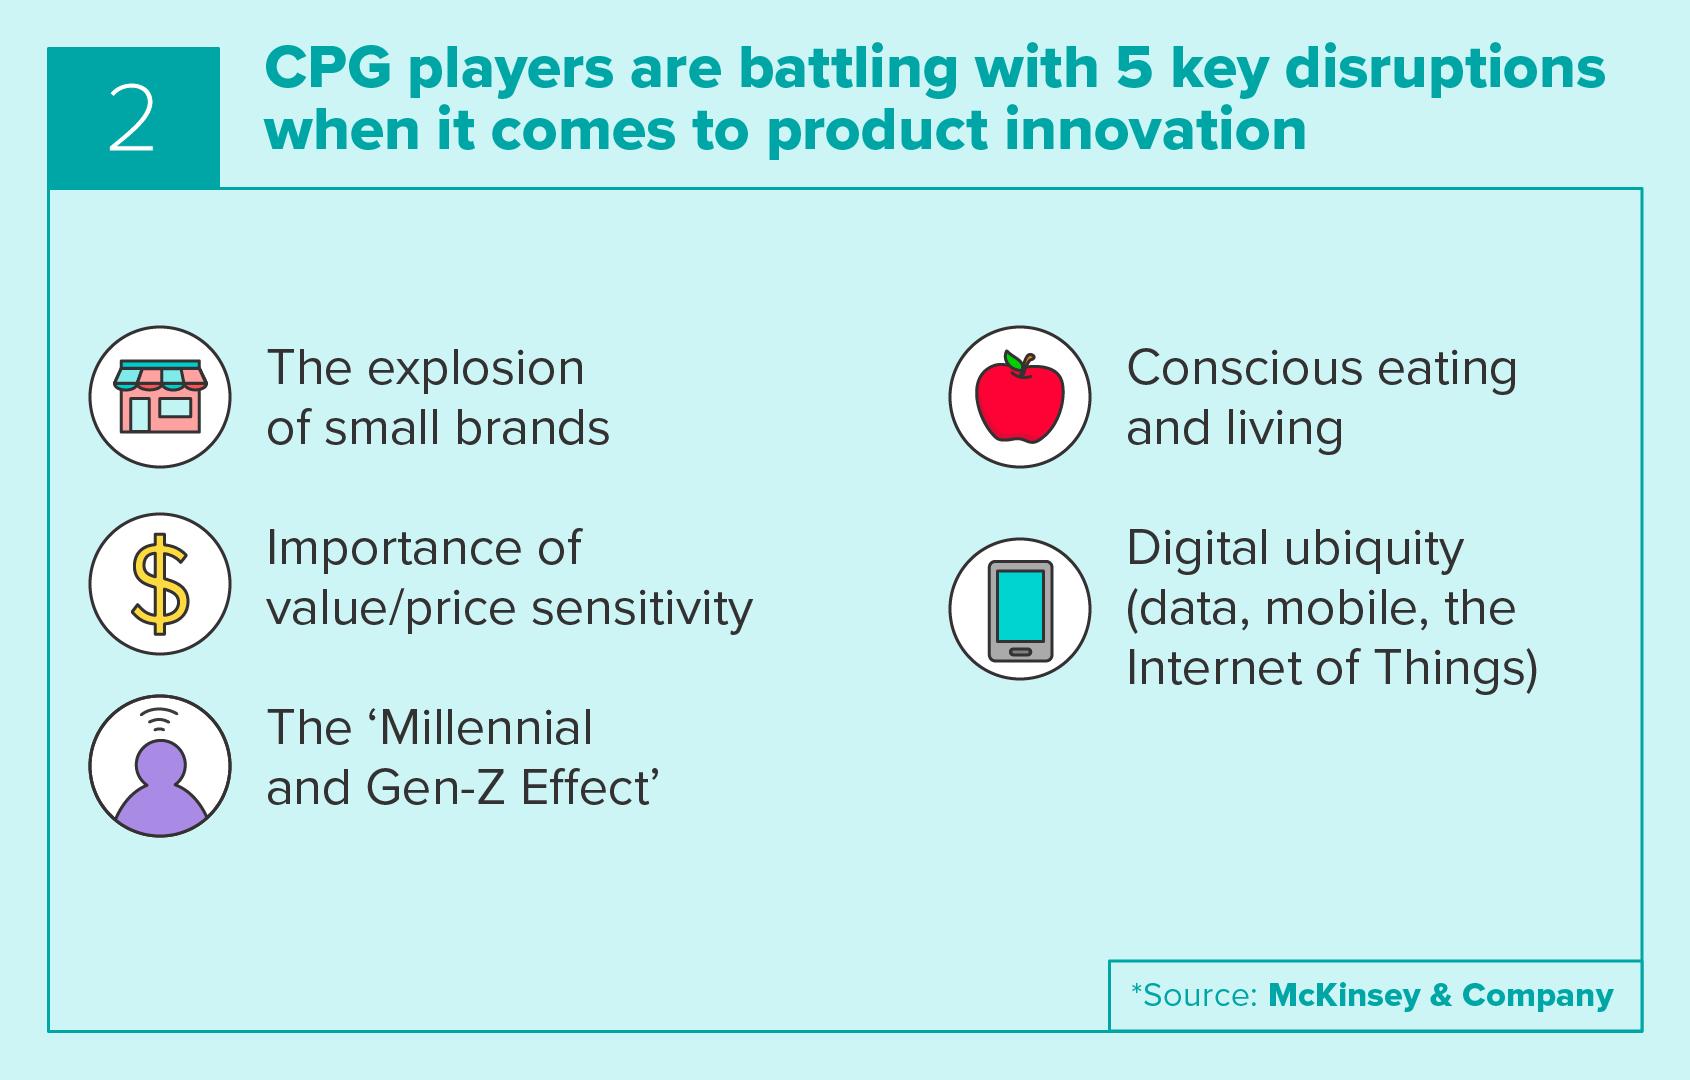 5 key disruptions